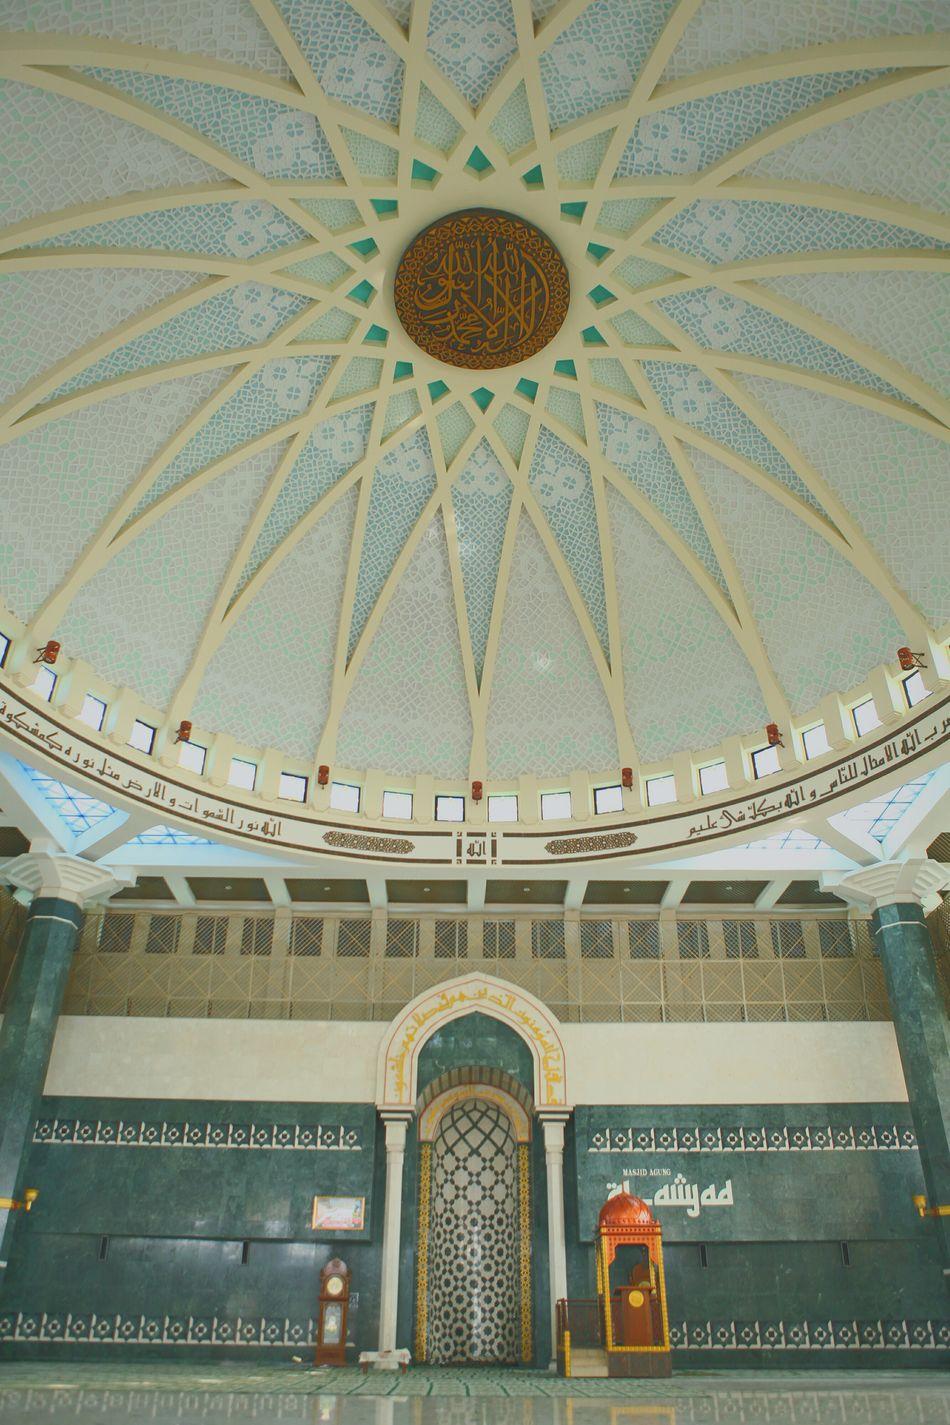 Mosque Masjid Tangerang Arsitektur Building